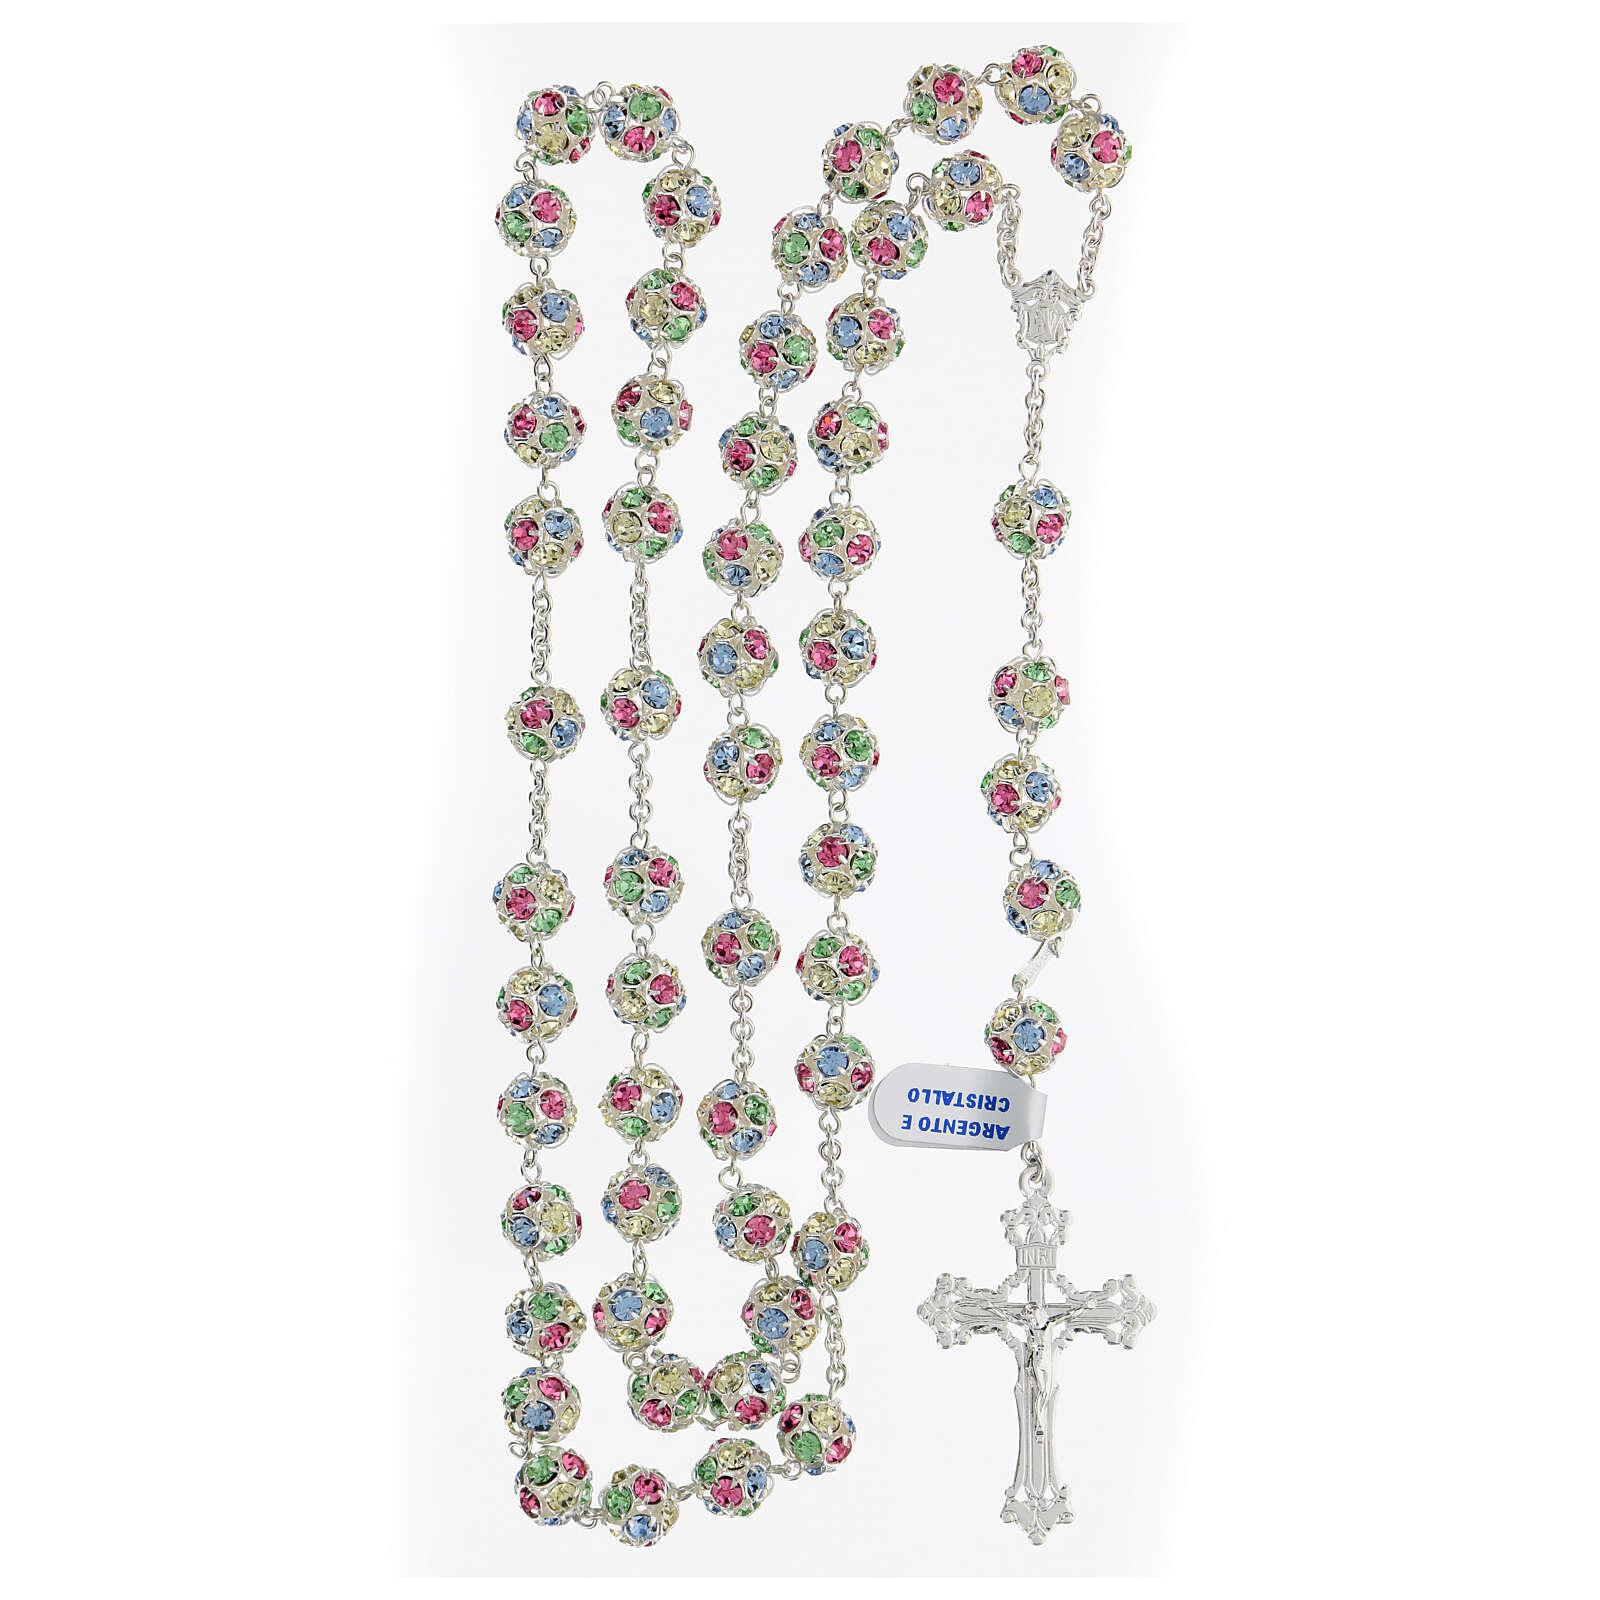 Rosario cristales coloreados granos 10 mm plata 925 cruz trilobulada 4